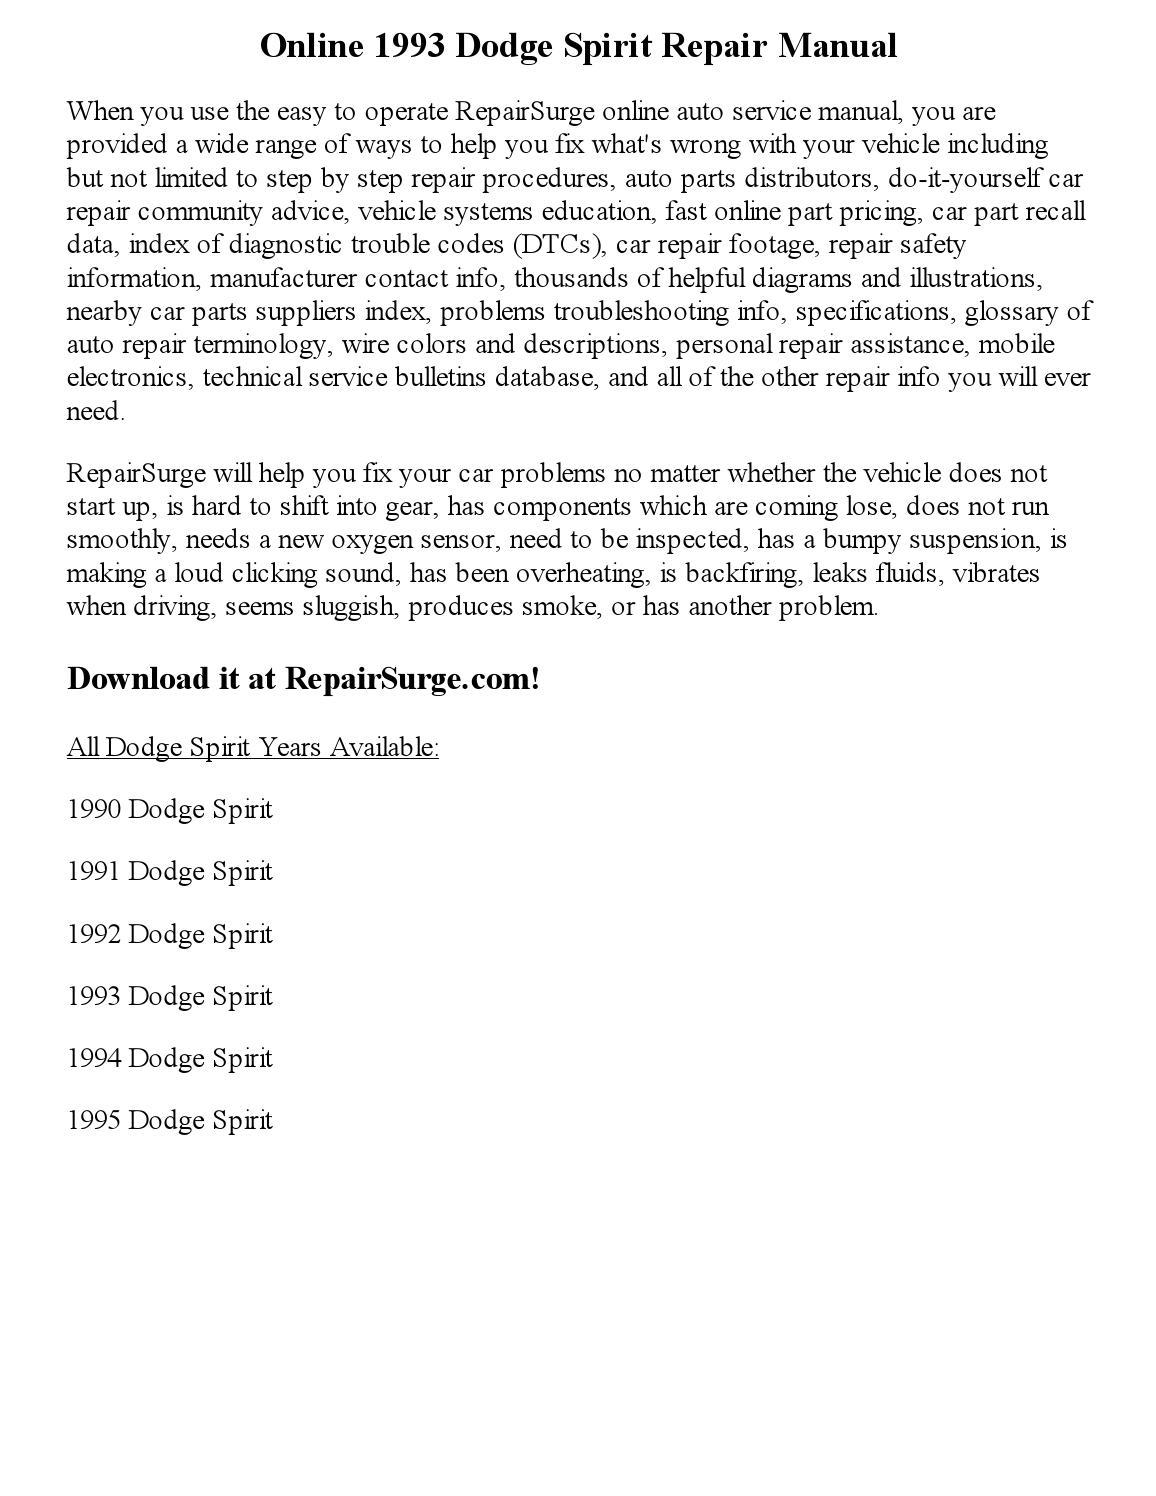 1993 Dodge Spirit Repair Manual Online By Jackson Paul Issuu 1990 Wiring Diagram